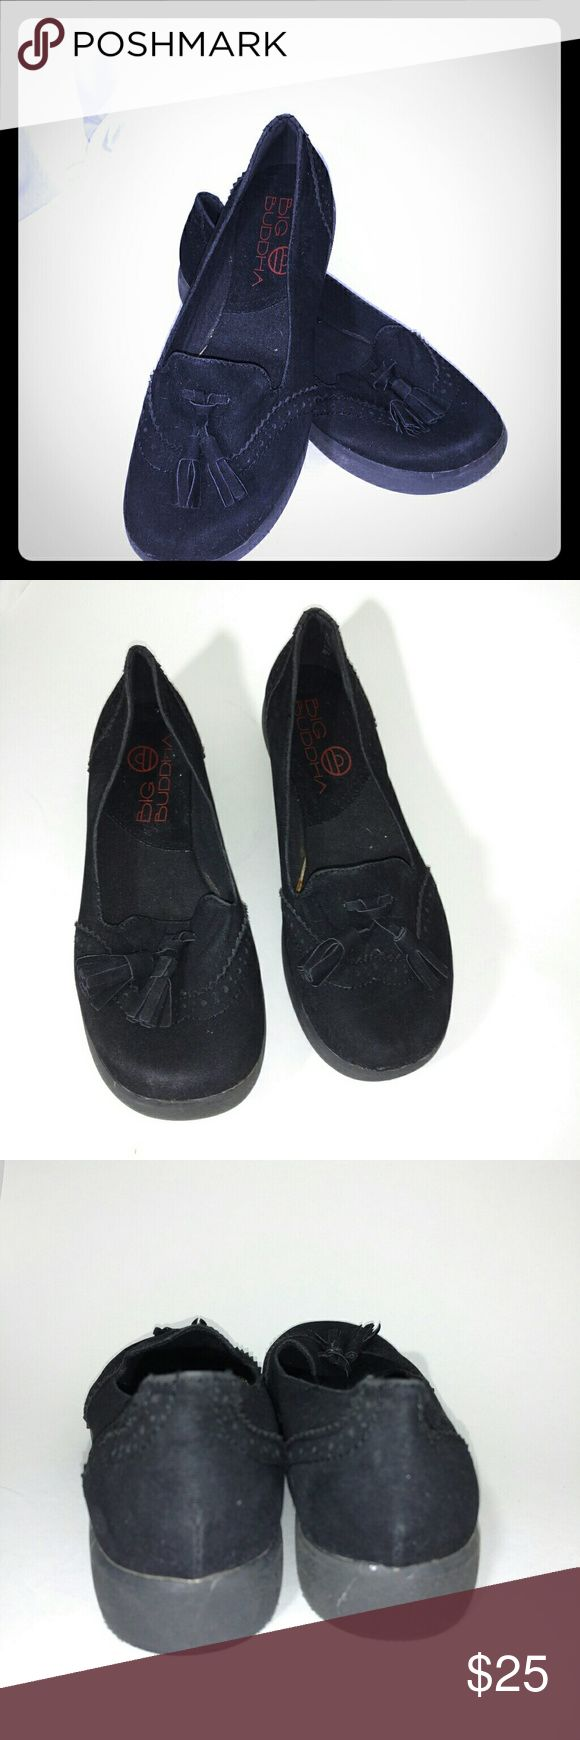 Big Buddha black loafers 8.5 Big Buddha black loafers, has 2 tassels on each shoe size 8.5 m. Like new Big Buddha Shoes Flats & Loafers